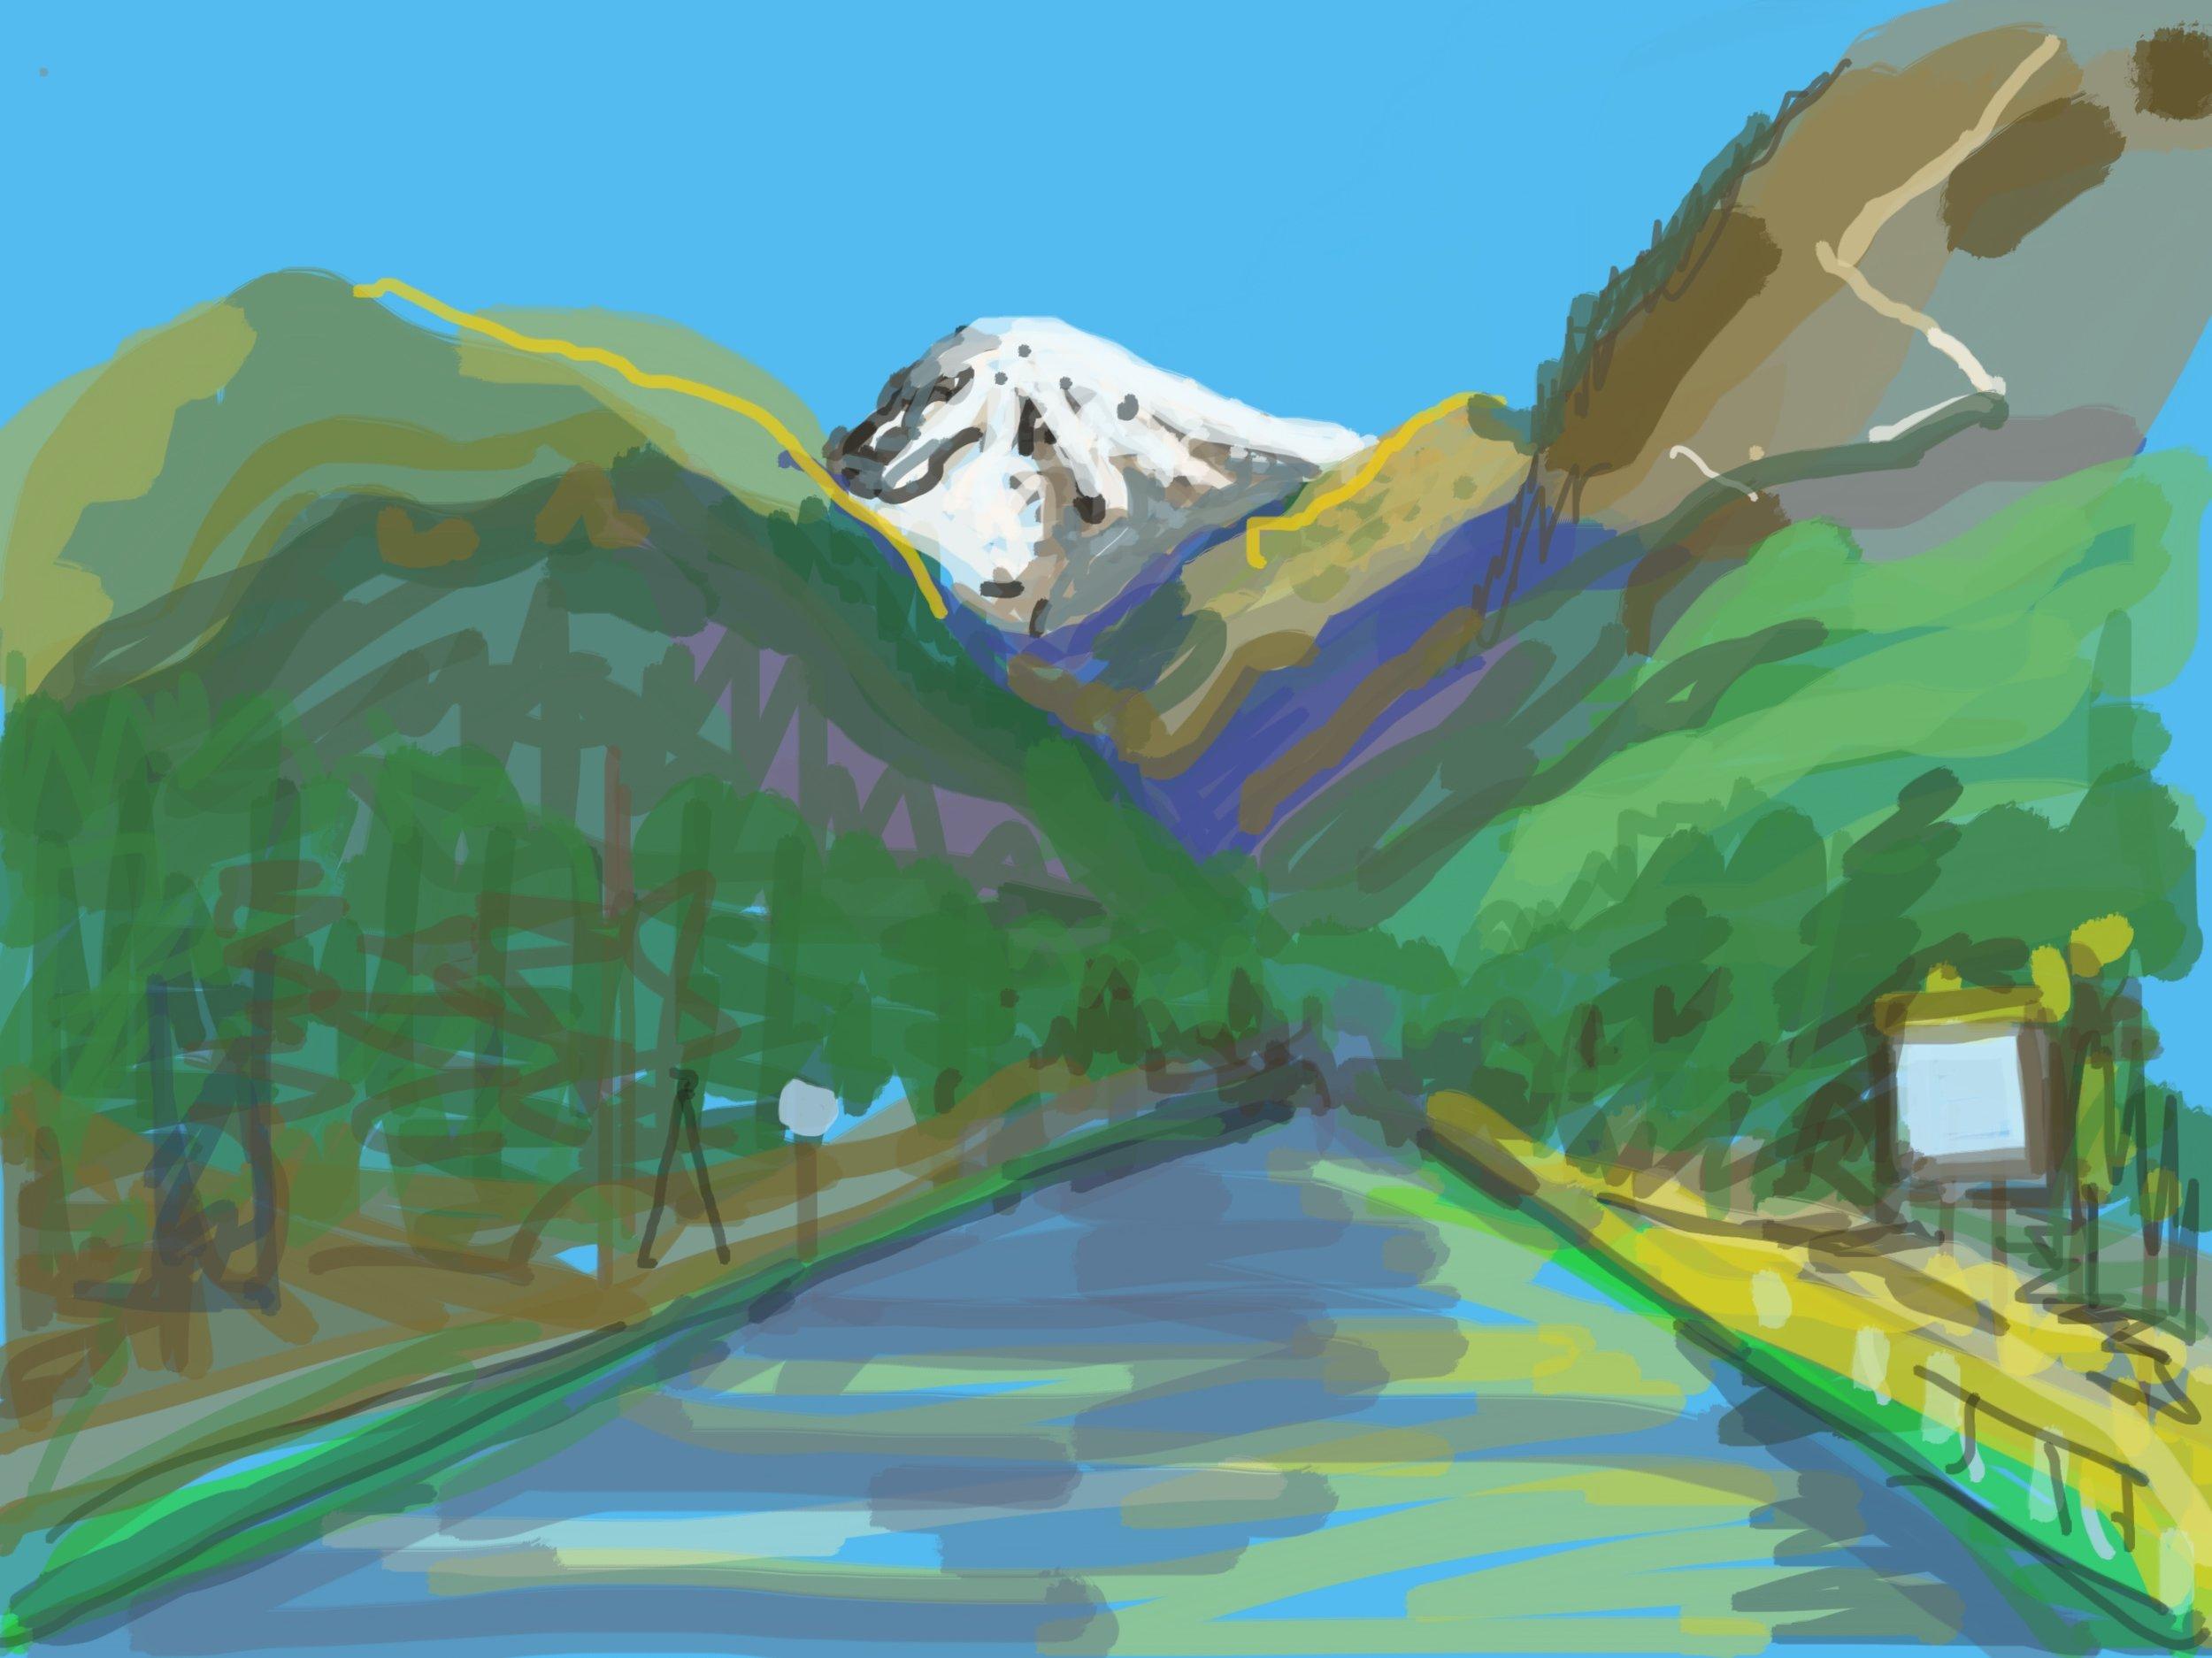 Aosta April '17